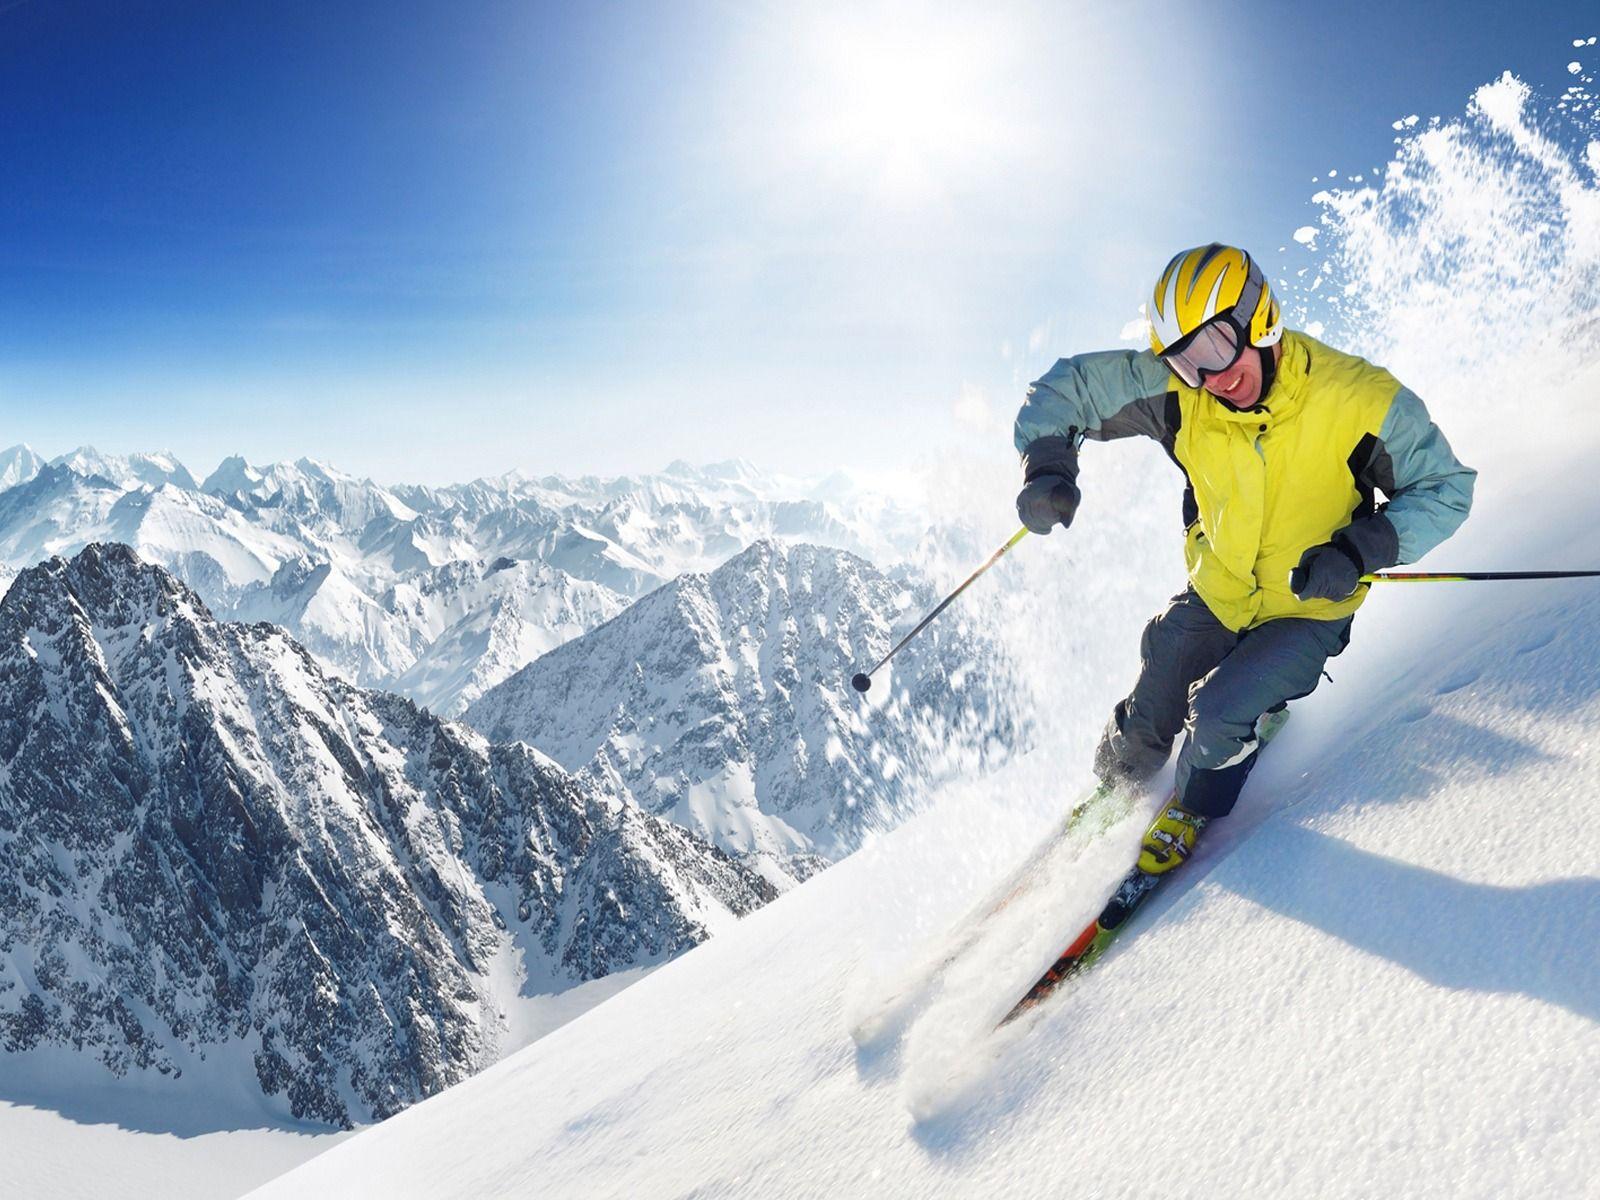 Extreme Skiing Wallpaper